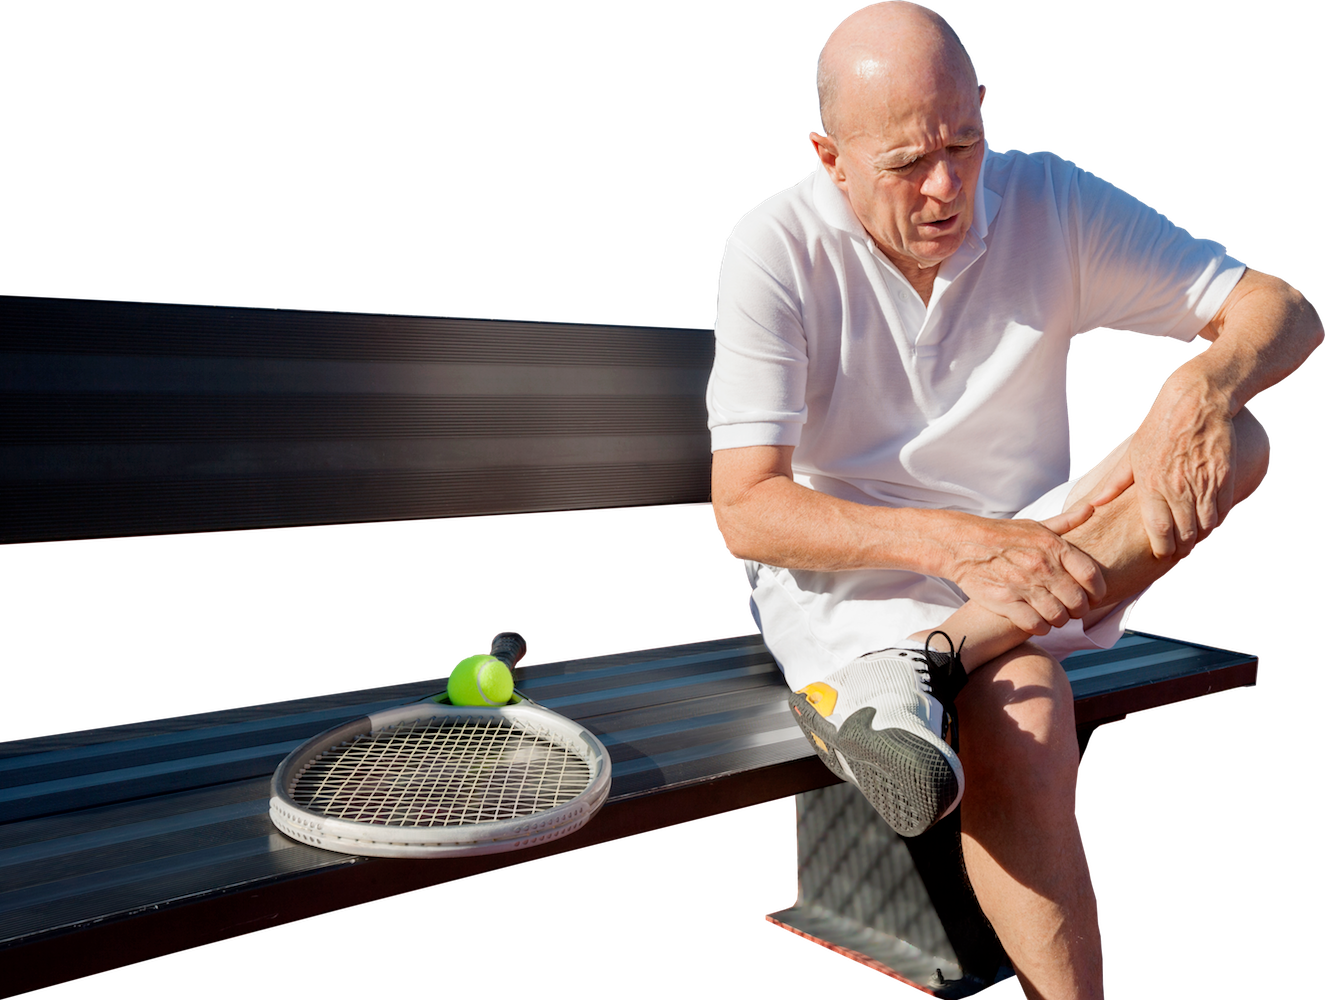 tennis-traumatic